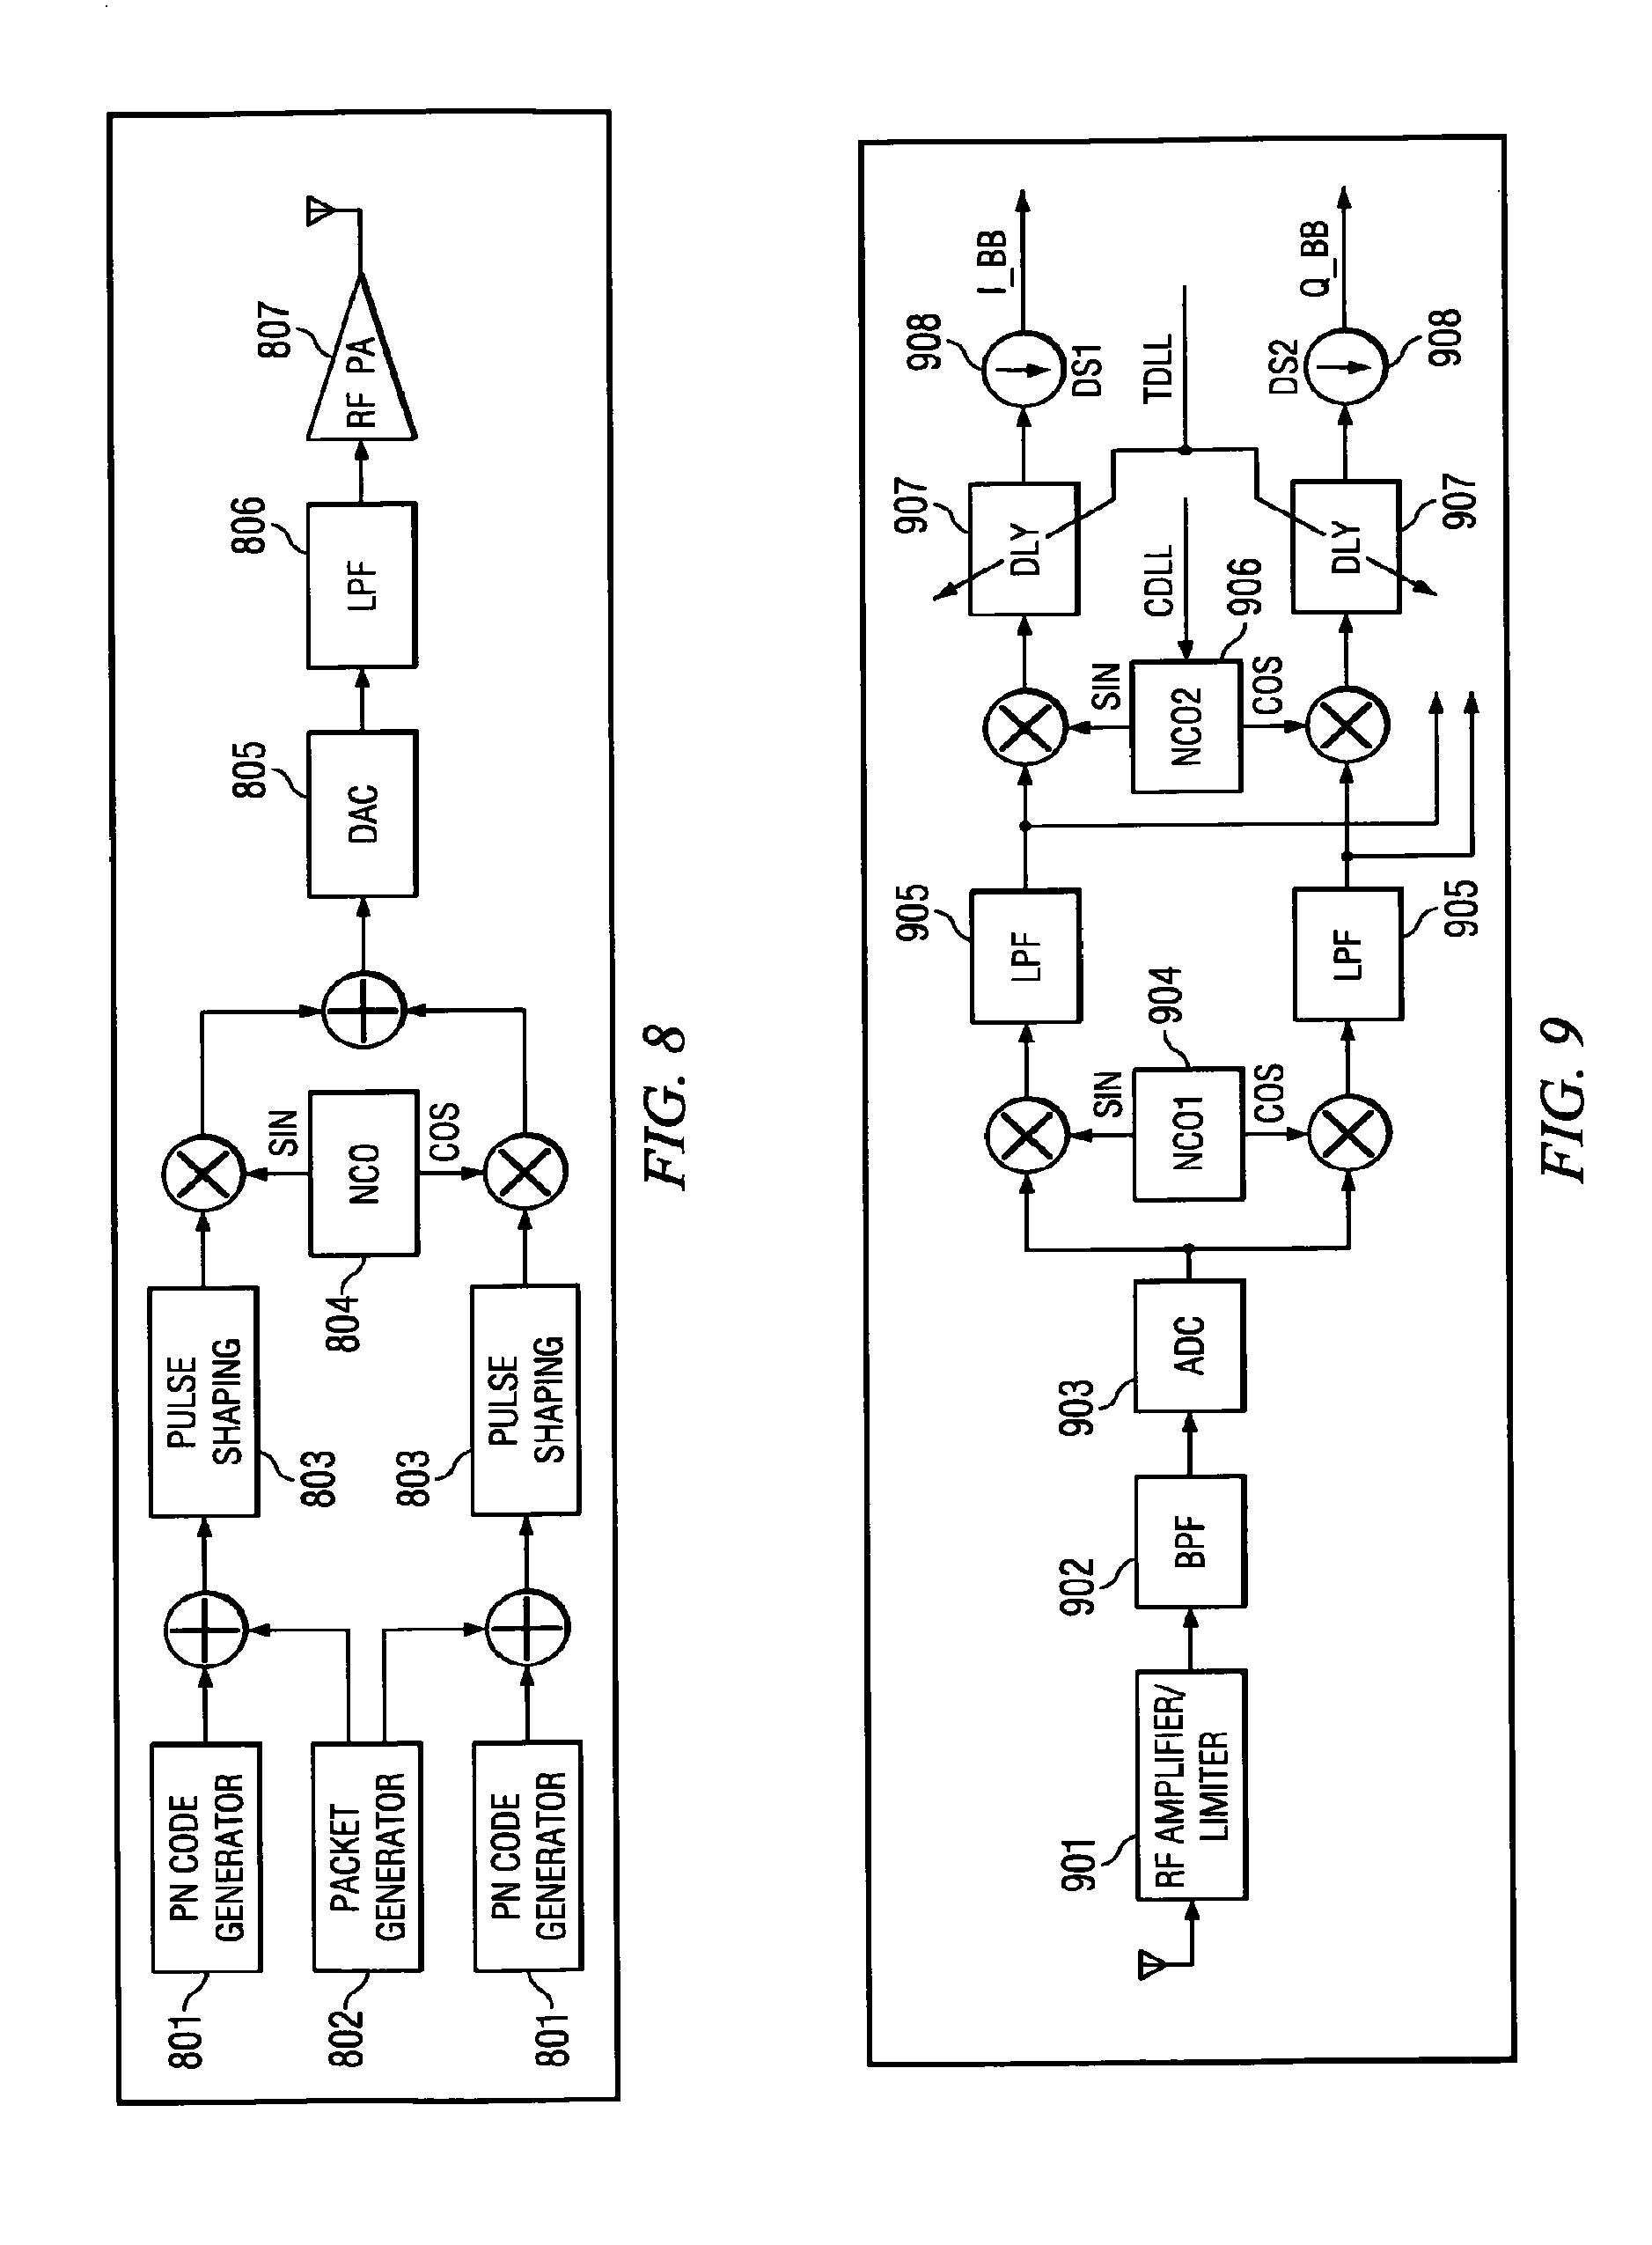 70v speaker wiring diagram two way anova pdf system design imageresizertool com